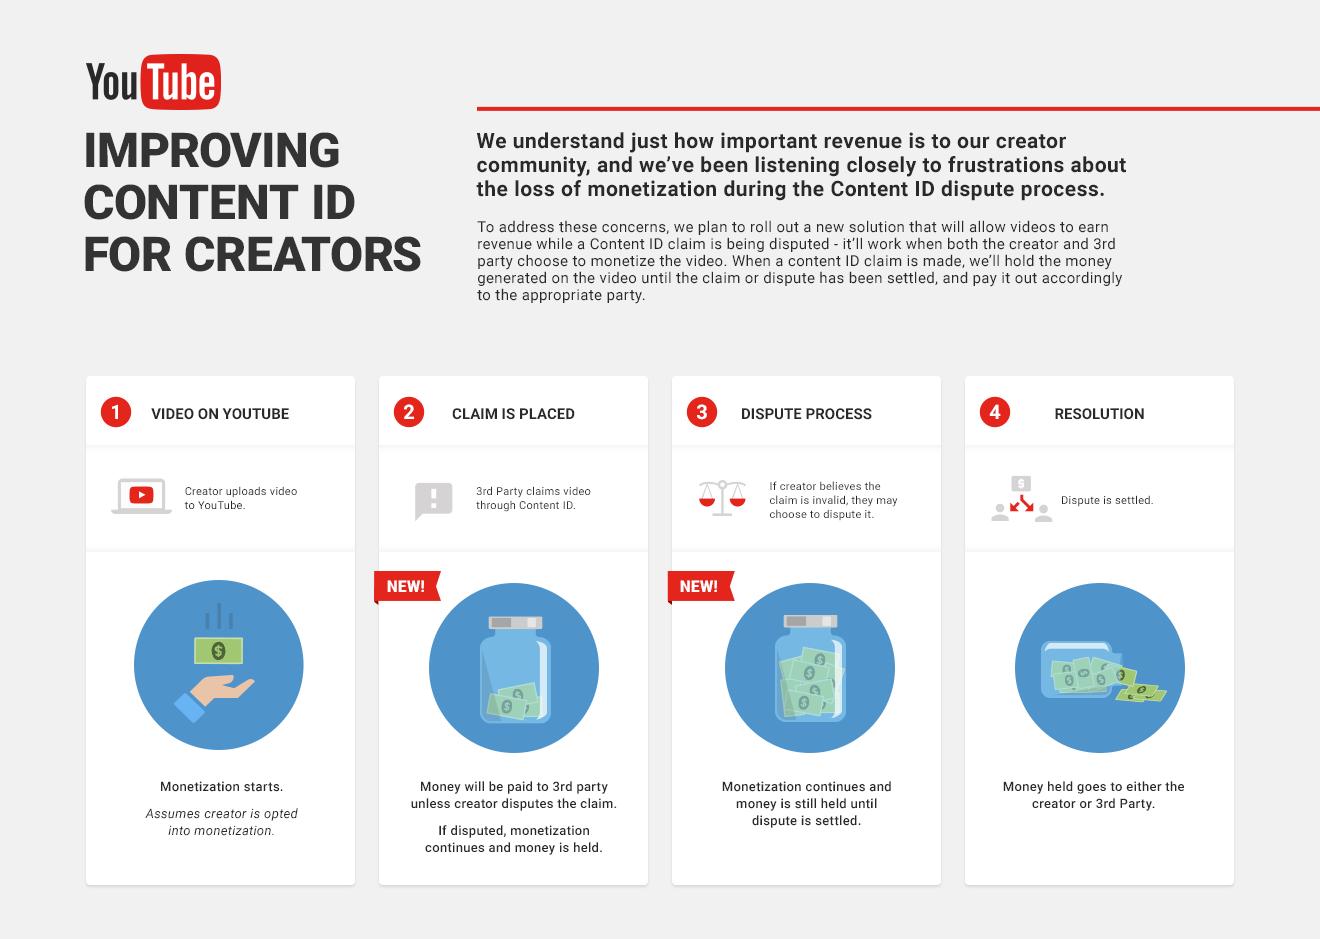 YouTube zmiany w Content ID.